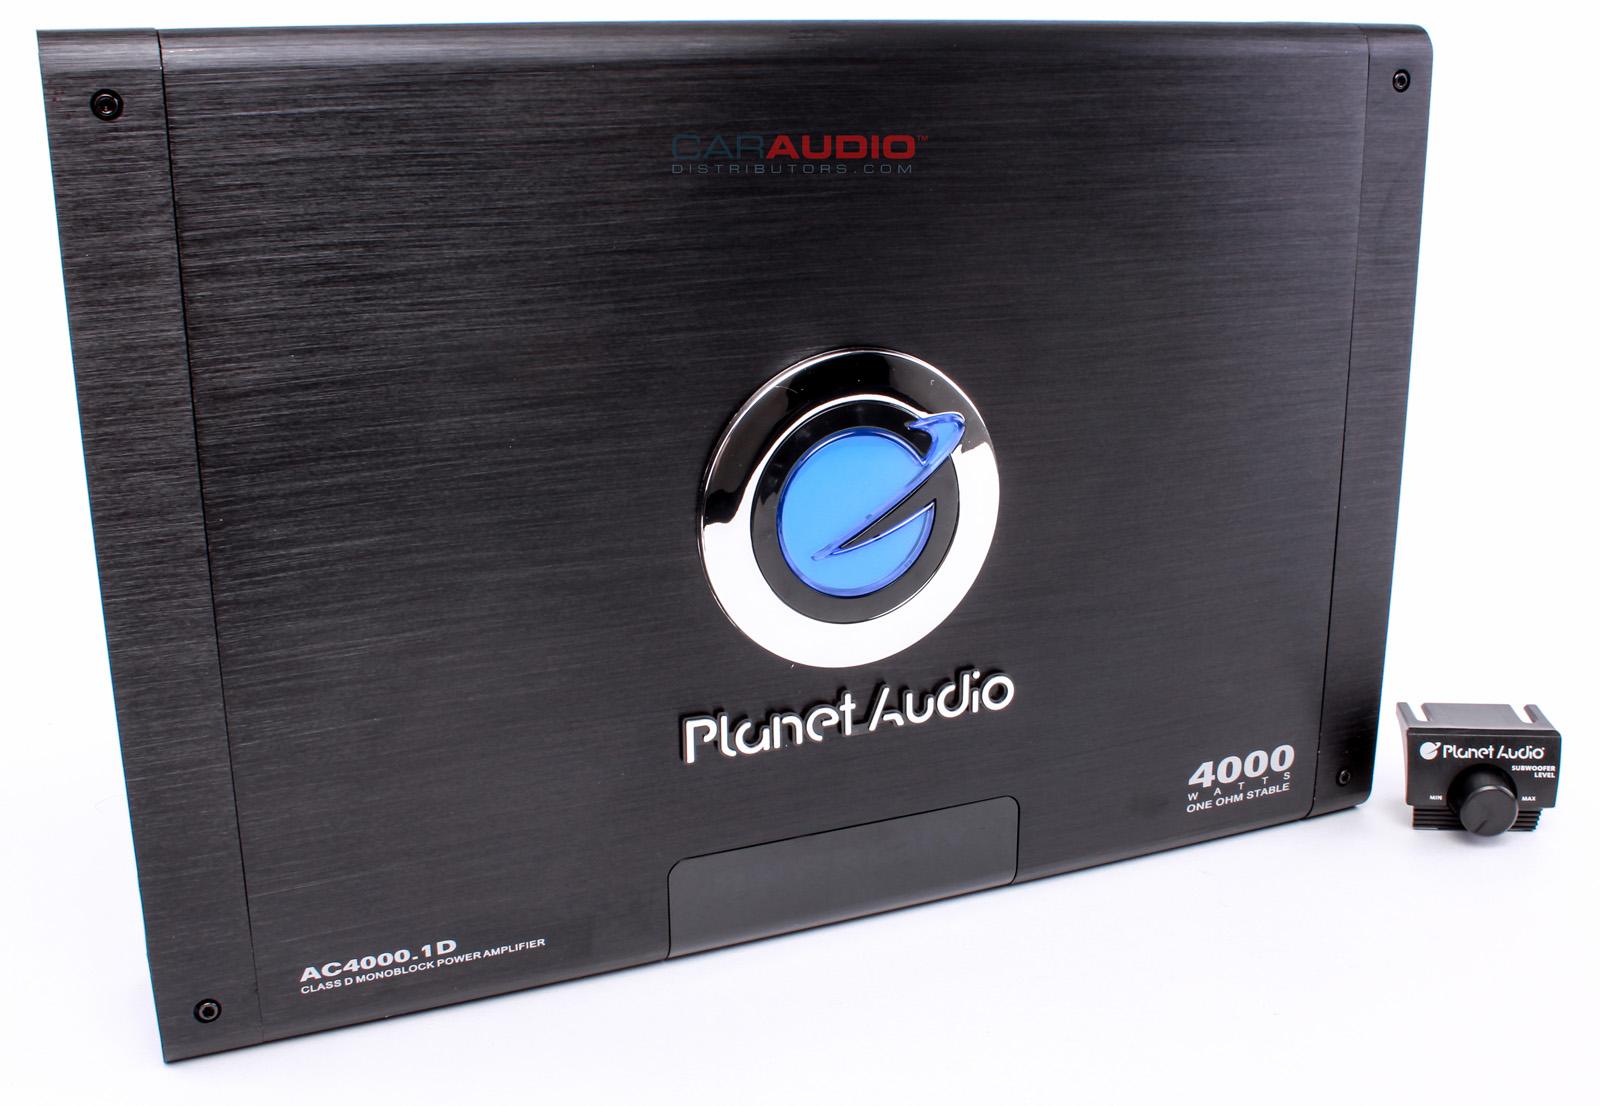 new planet audio ac4000 1d anarchy monoblock 4000w class d power car amplifier ebay. Black Bedroom Furniture Sets. Home Design Ideas